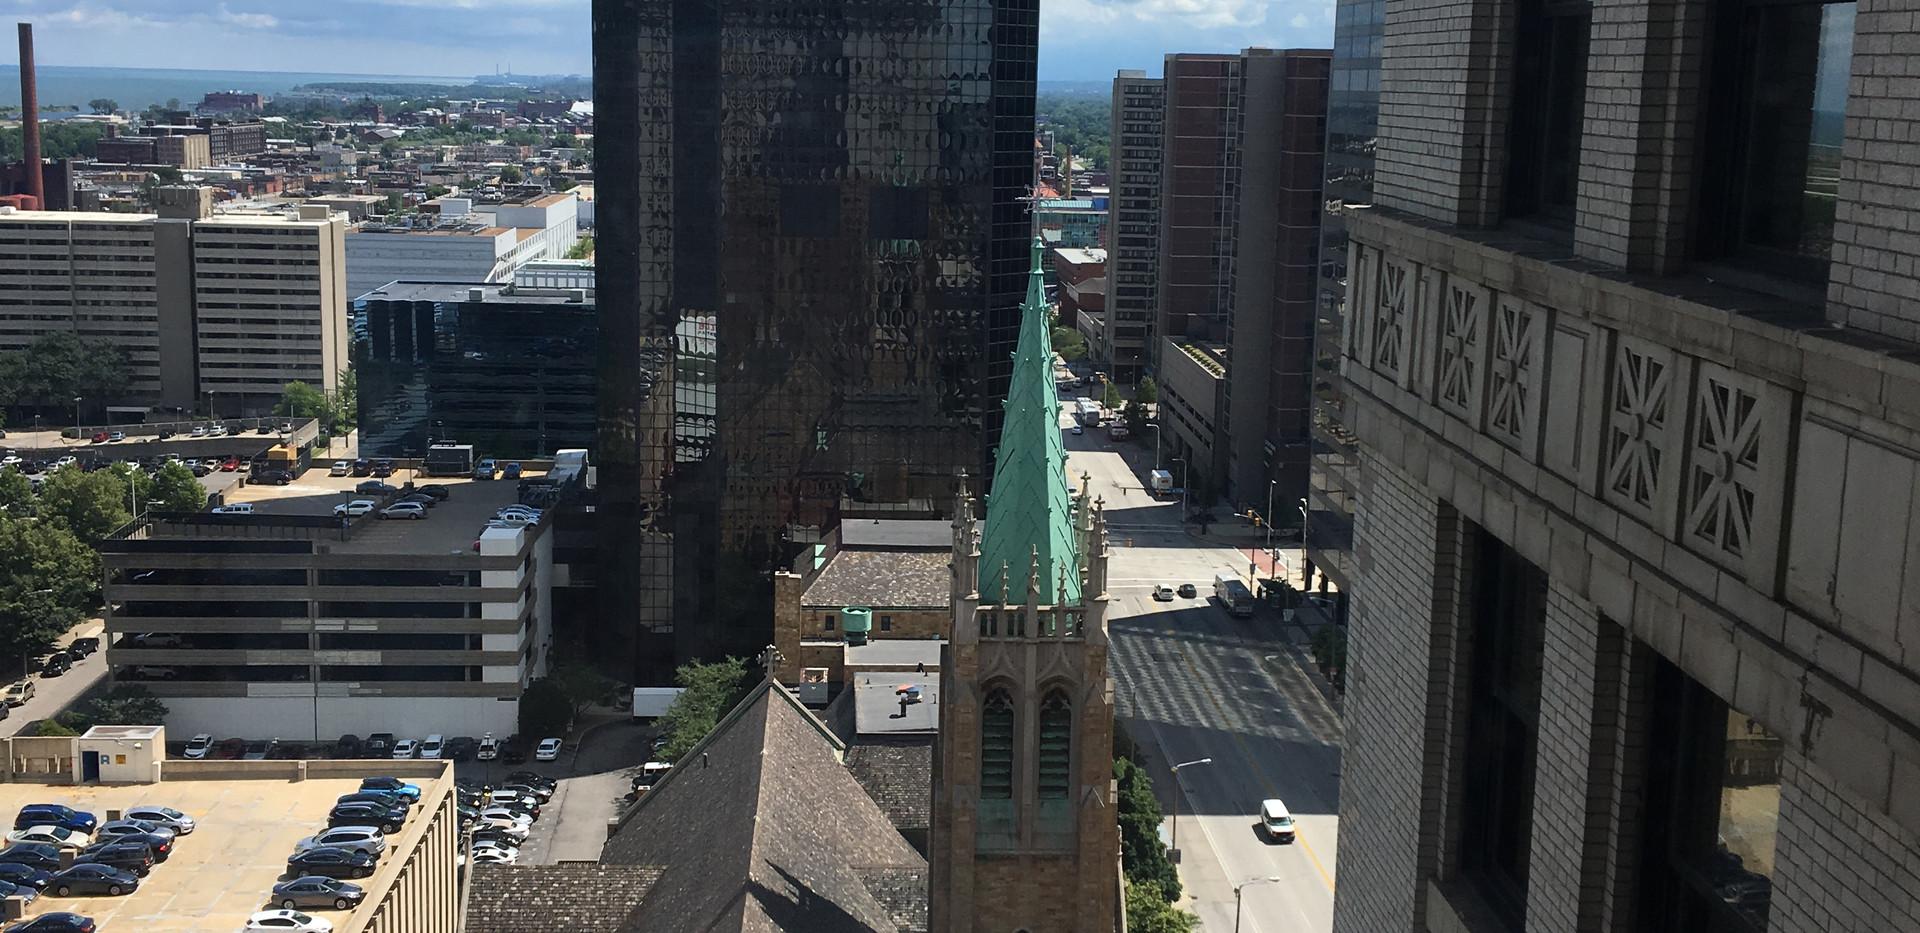 City Club Building view